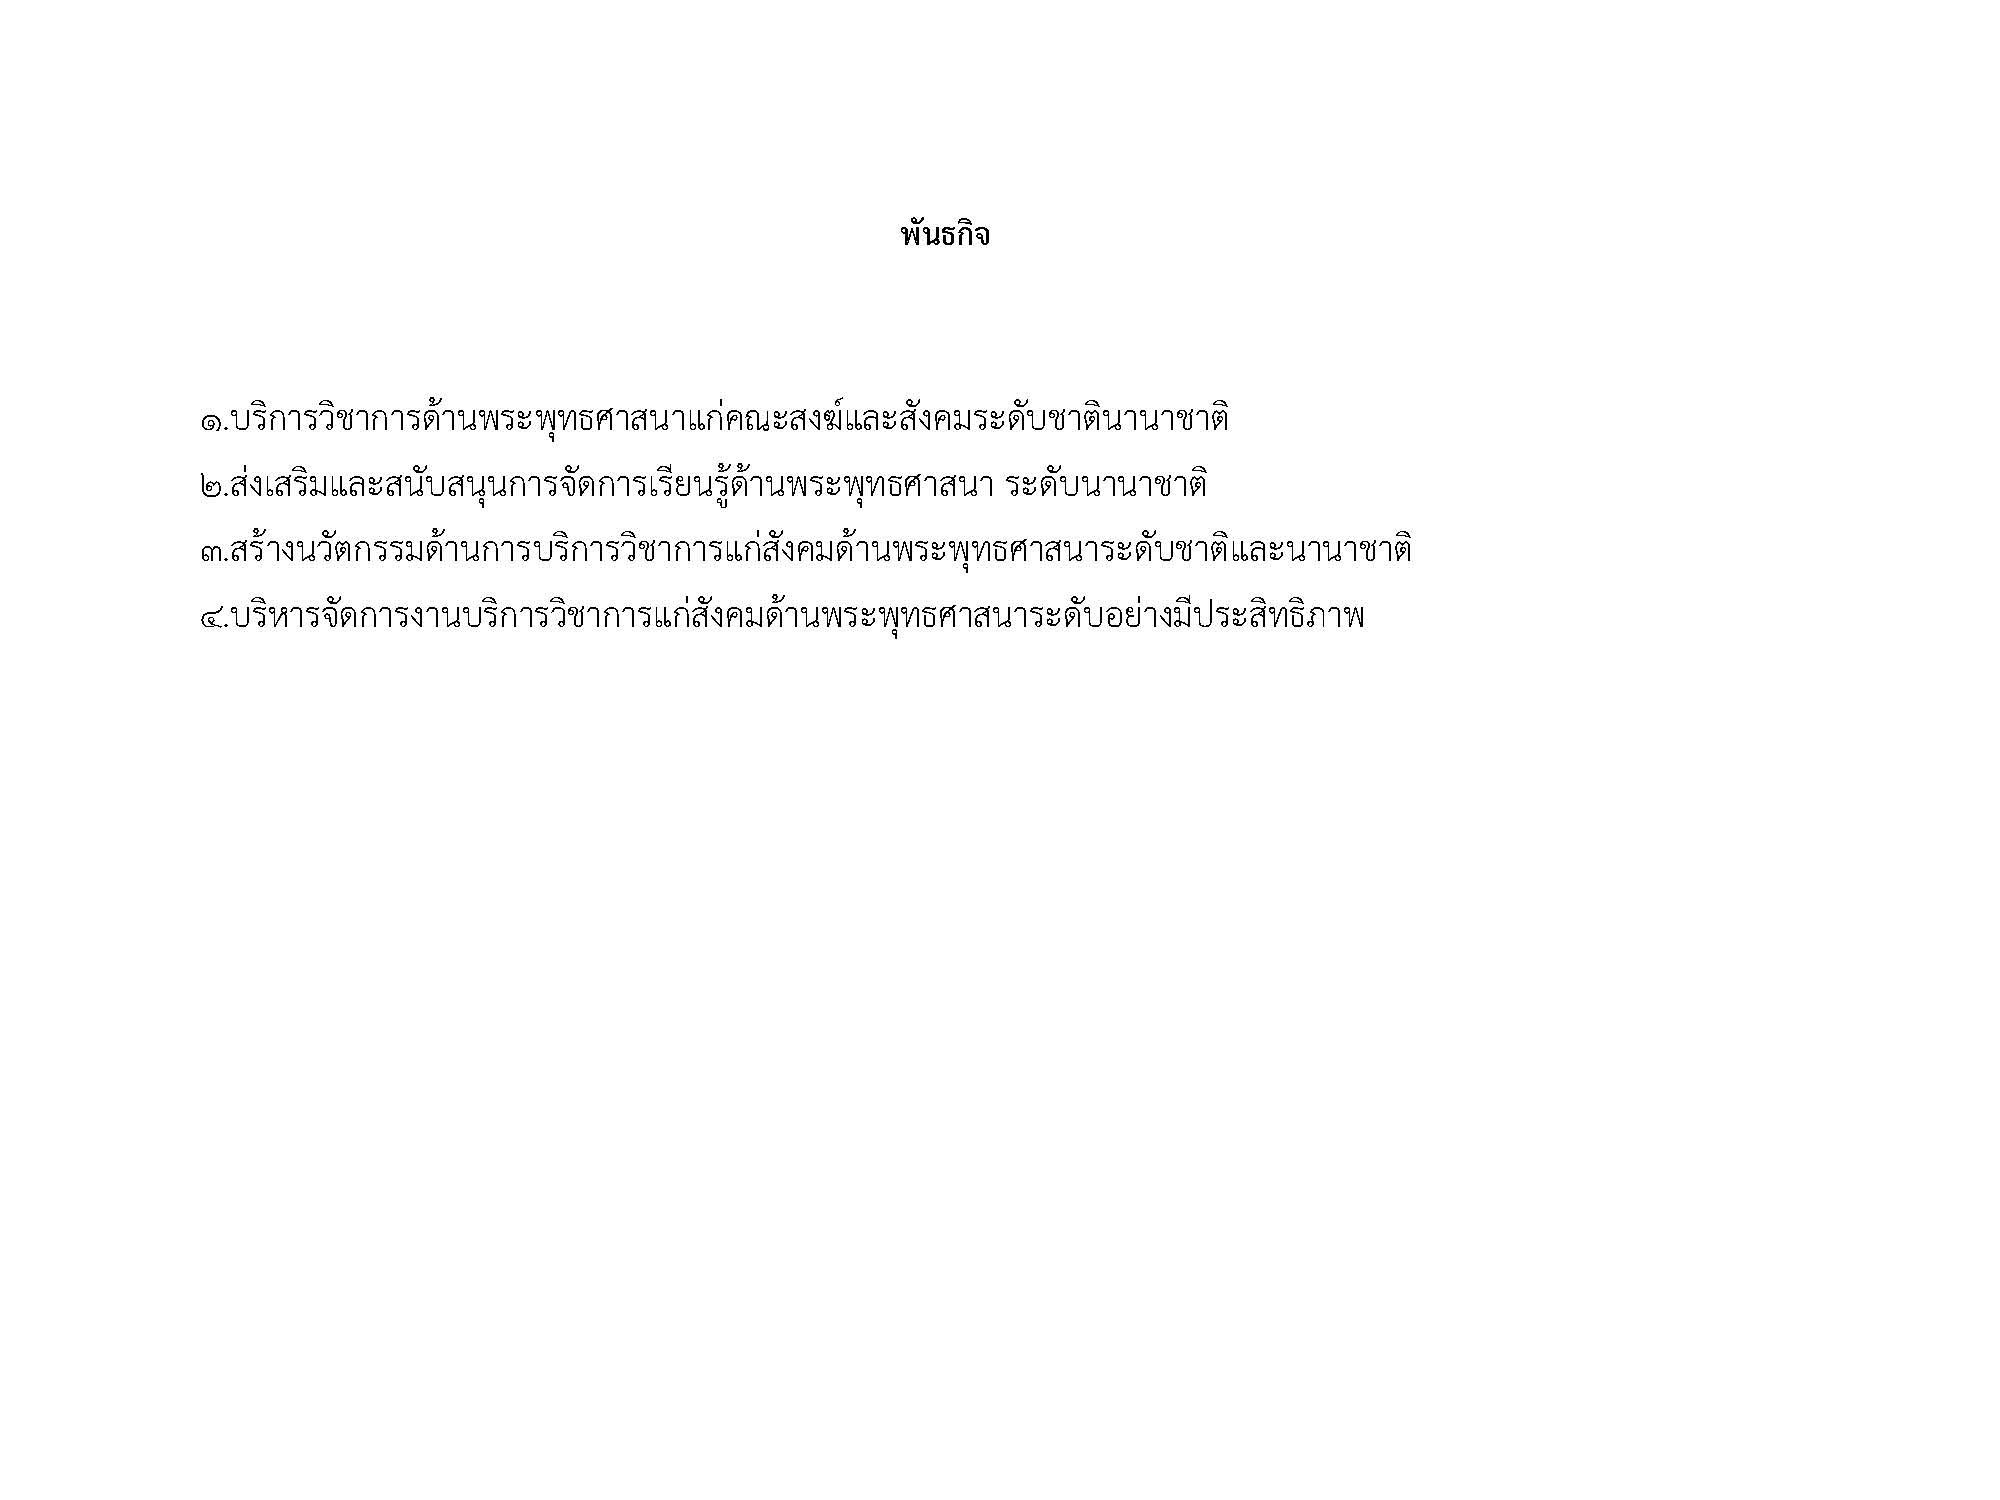 LG_Page_03